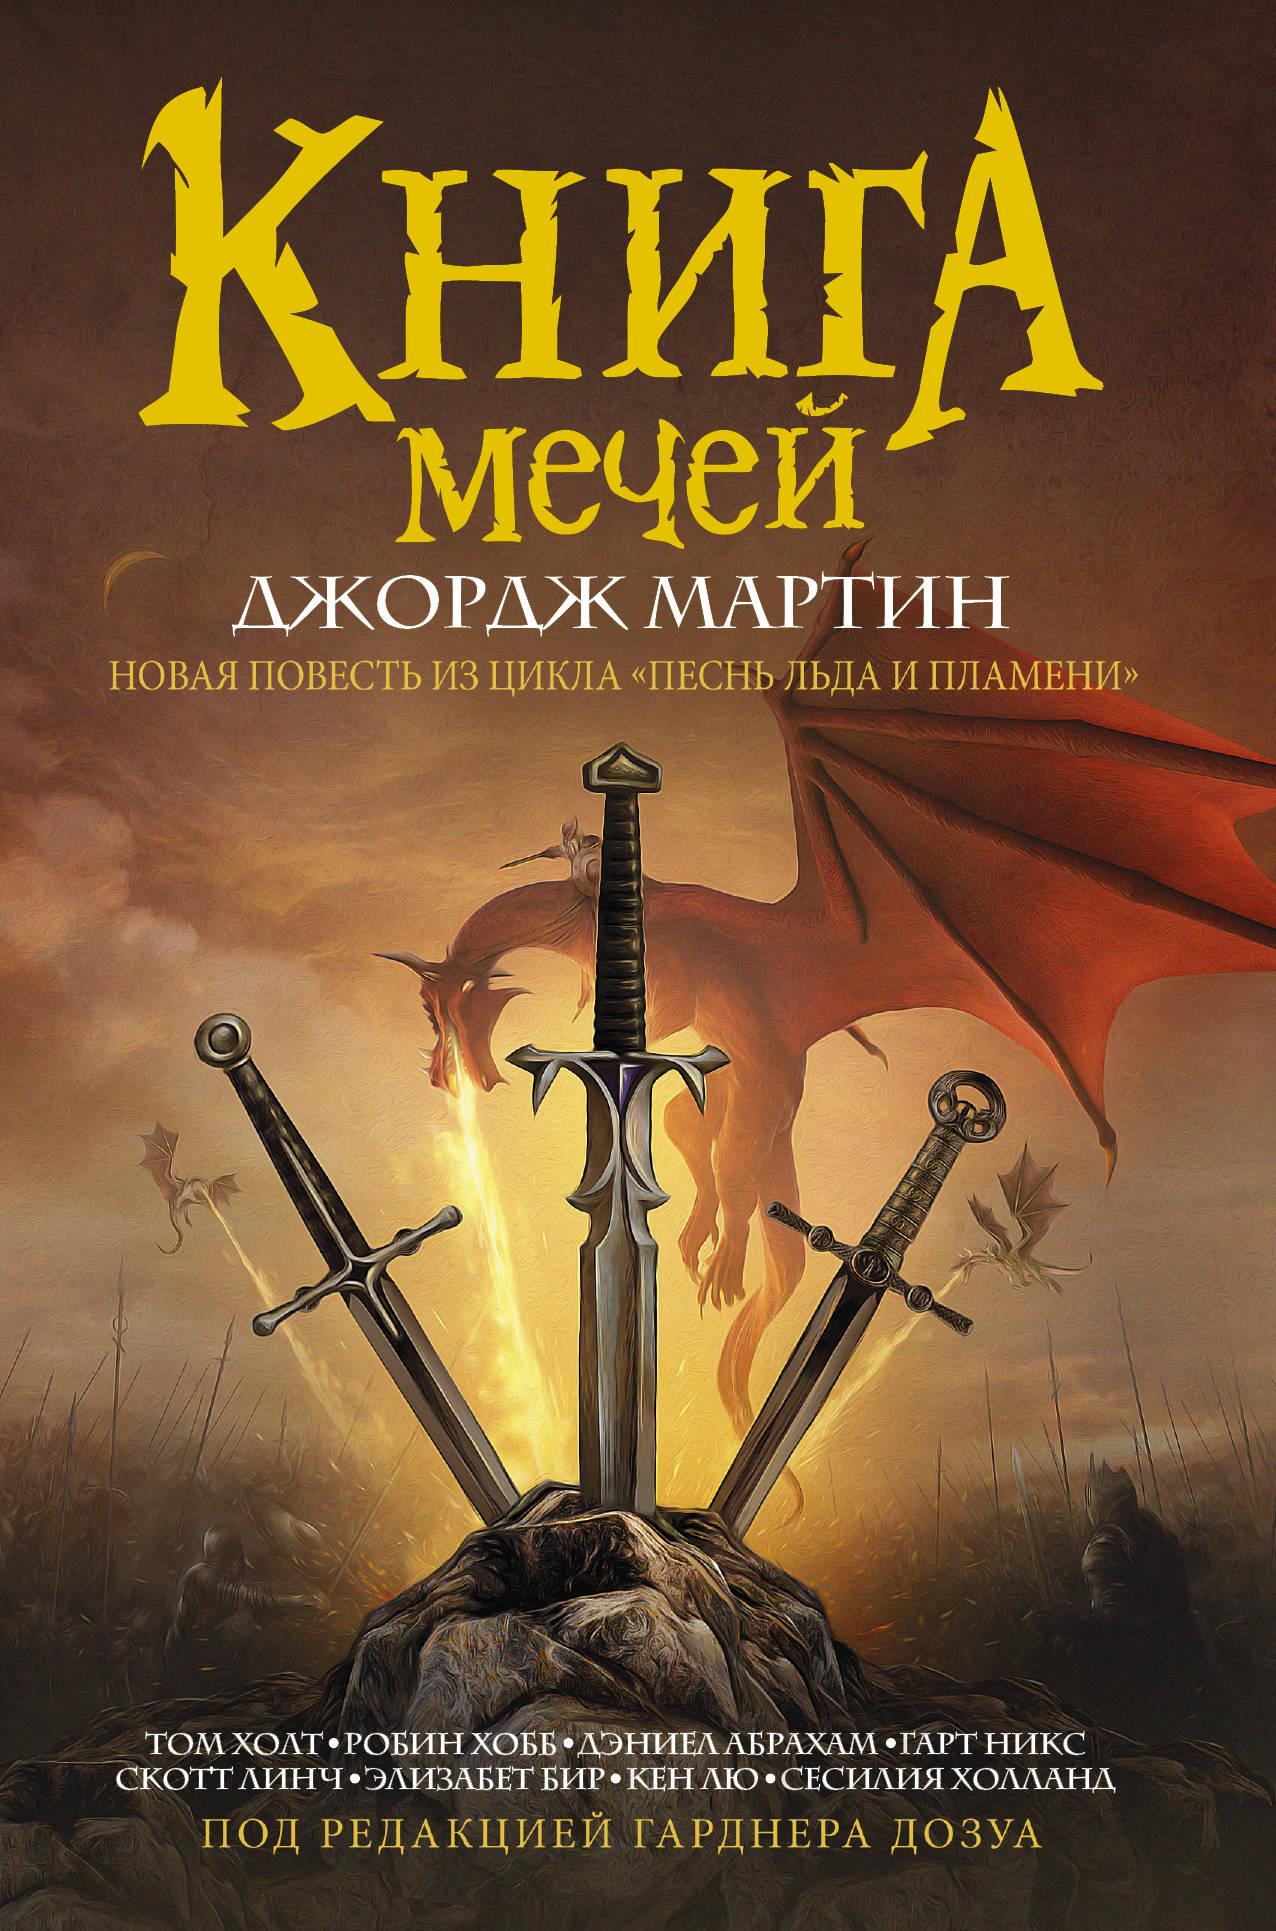 Мартин Джордж Р.Р., Гарднер Дозуа Книга мечей мартин дж буря мечей